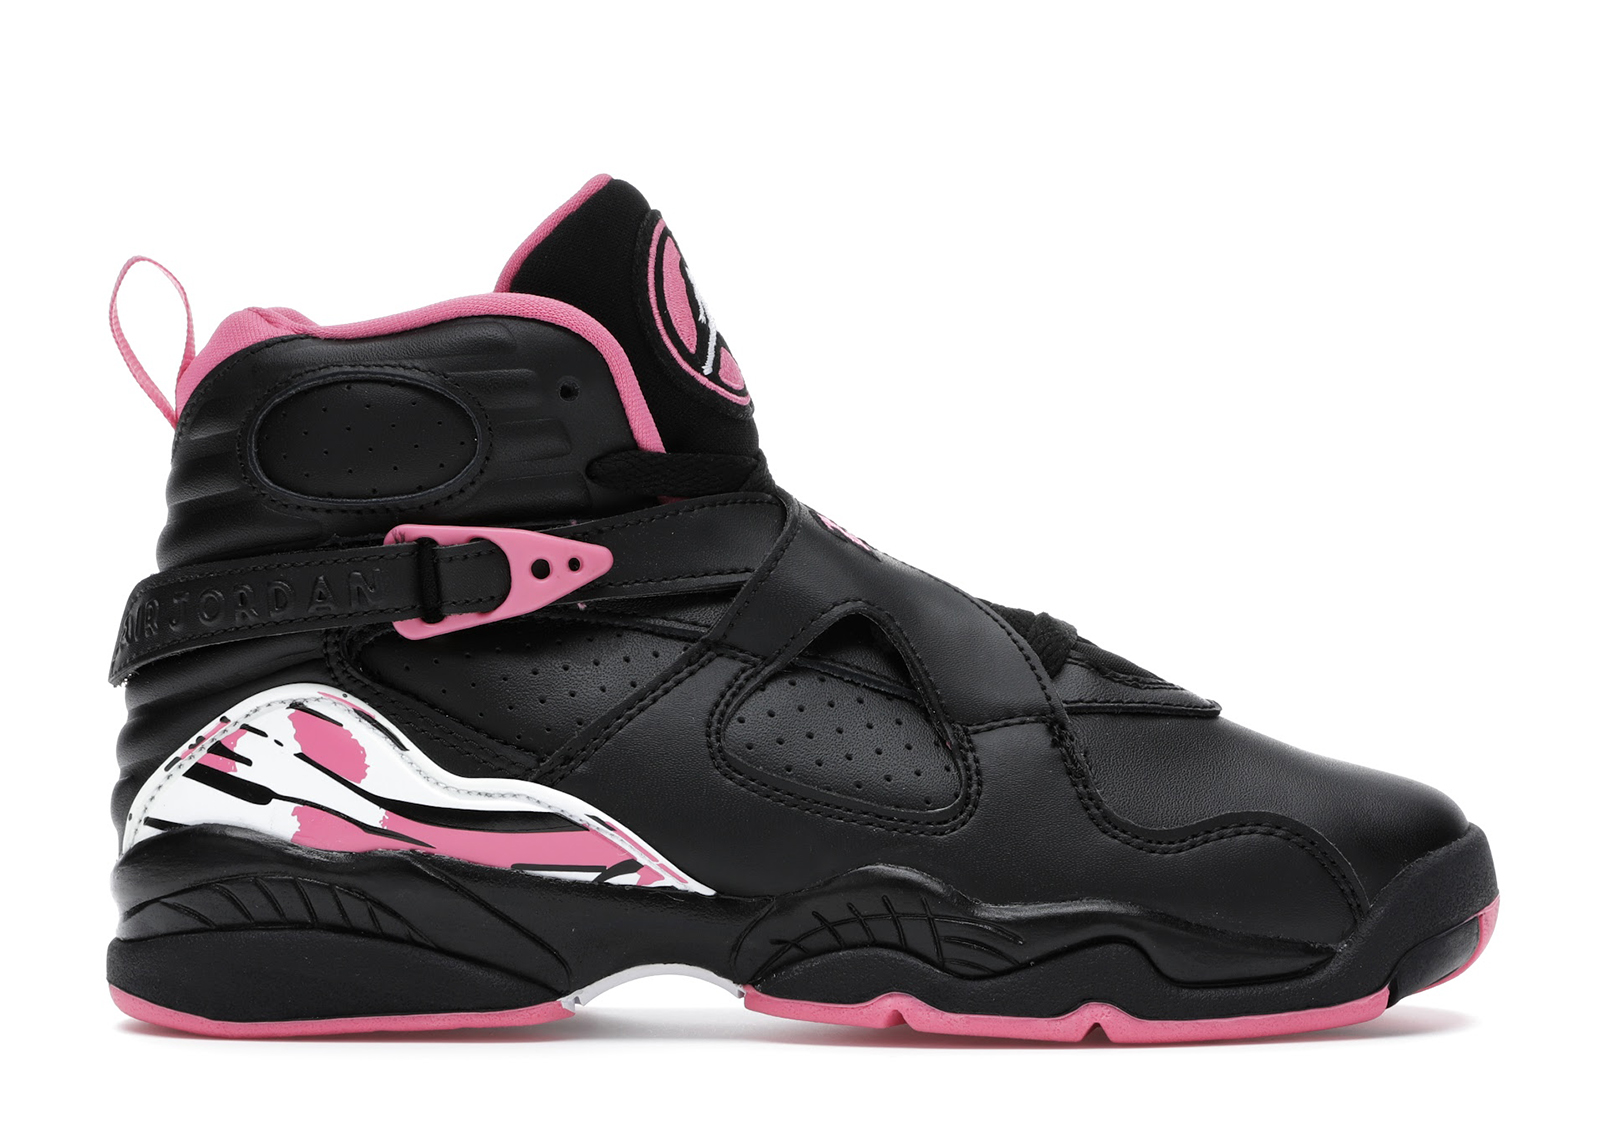 Buy Air Jordan 8 Shoes & Deadstock Sneakers